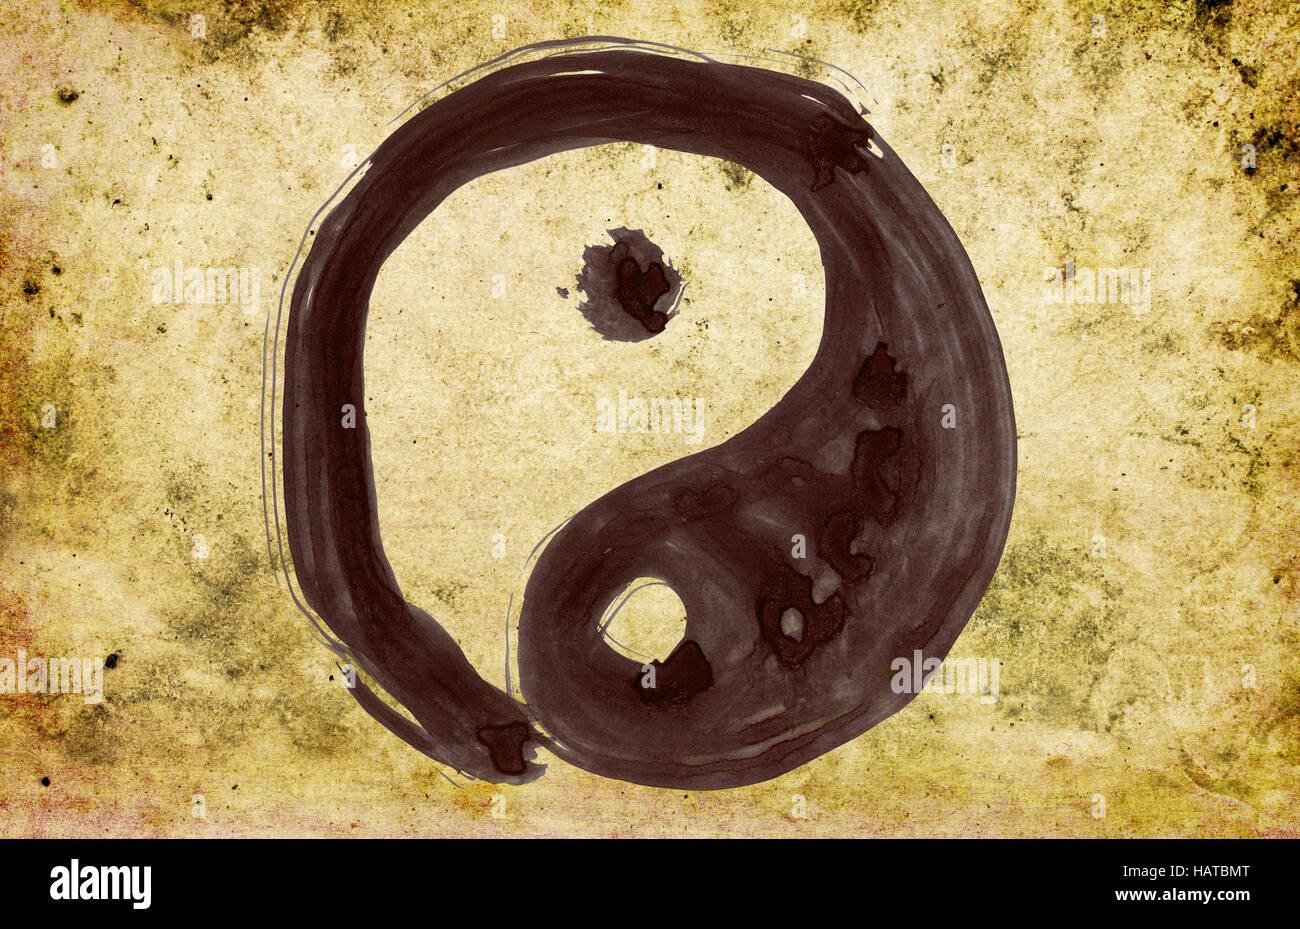 Yin und Yang - hand painted on background grunge - Stock Image